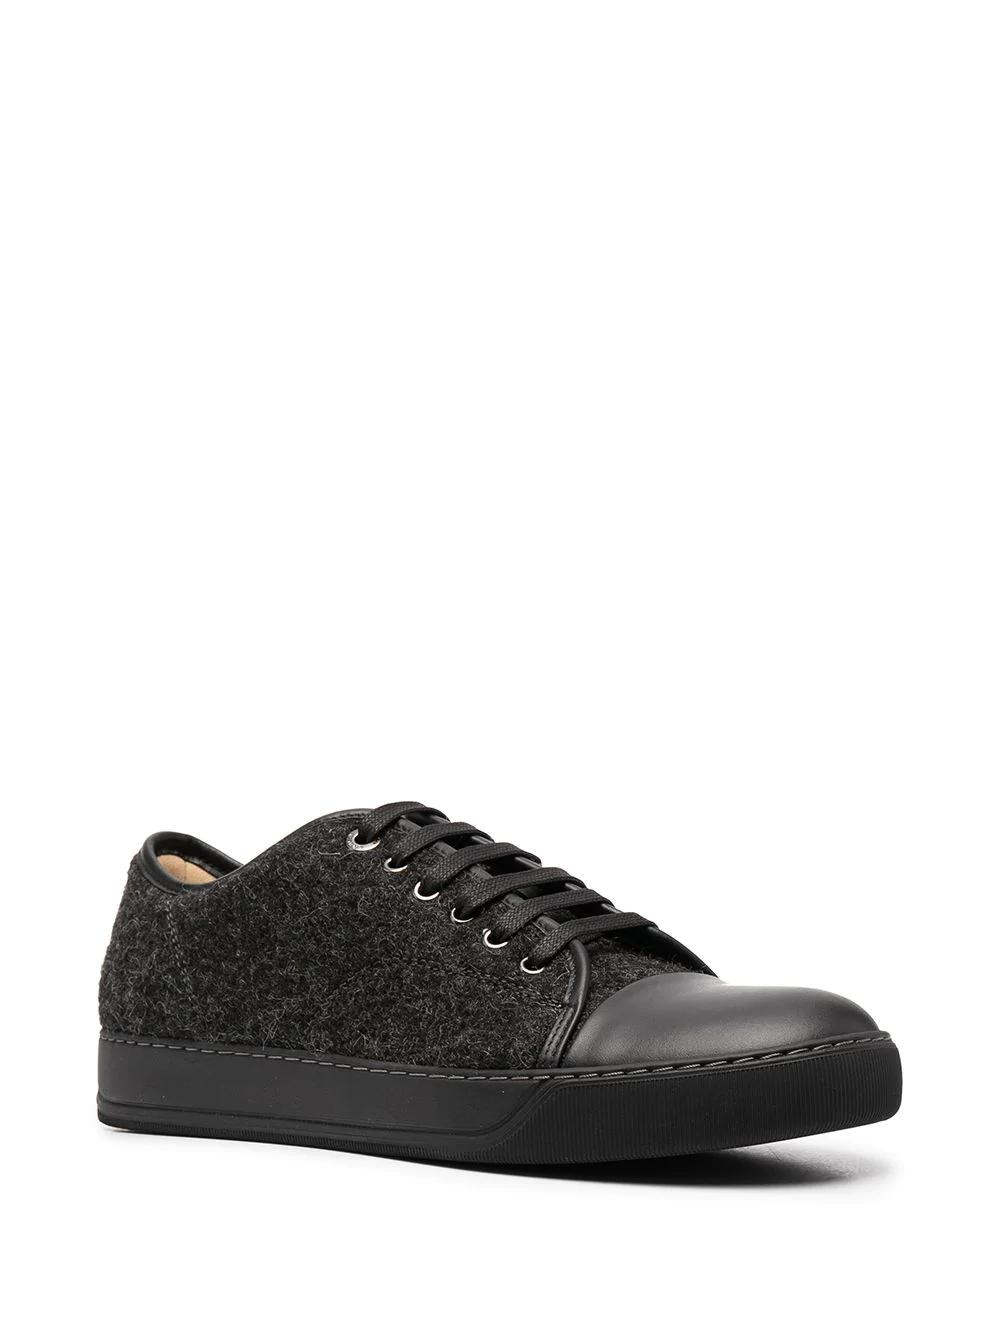 Lanvin Contrast Toe Lace Up Sneakers Farfetch Lanvin Sneakers Lace Up